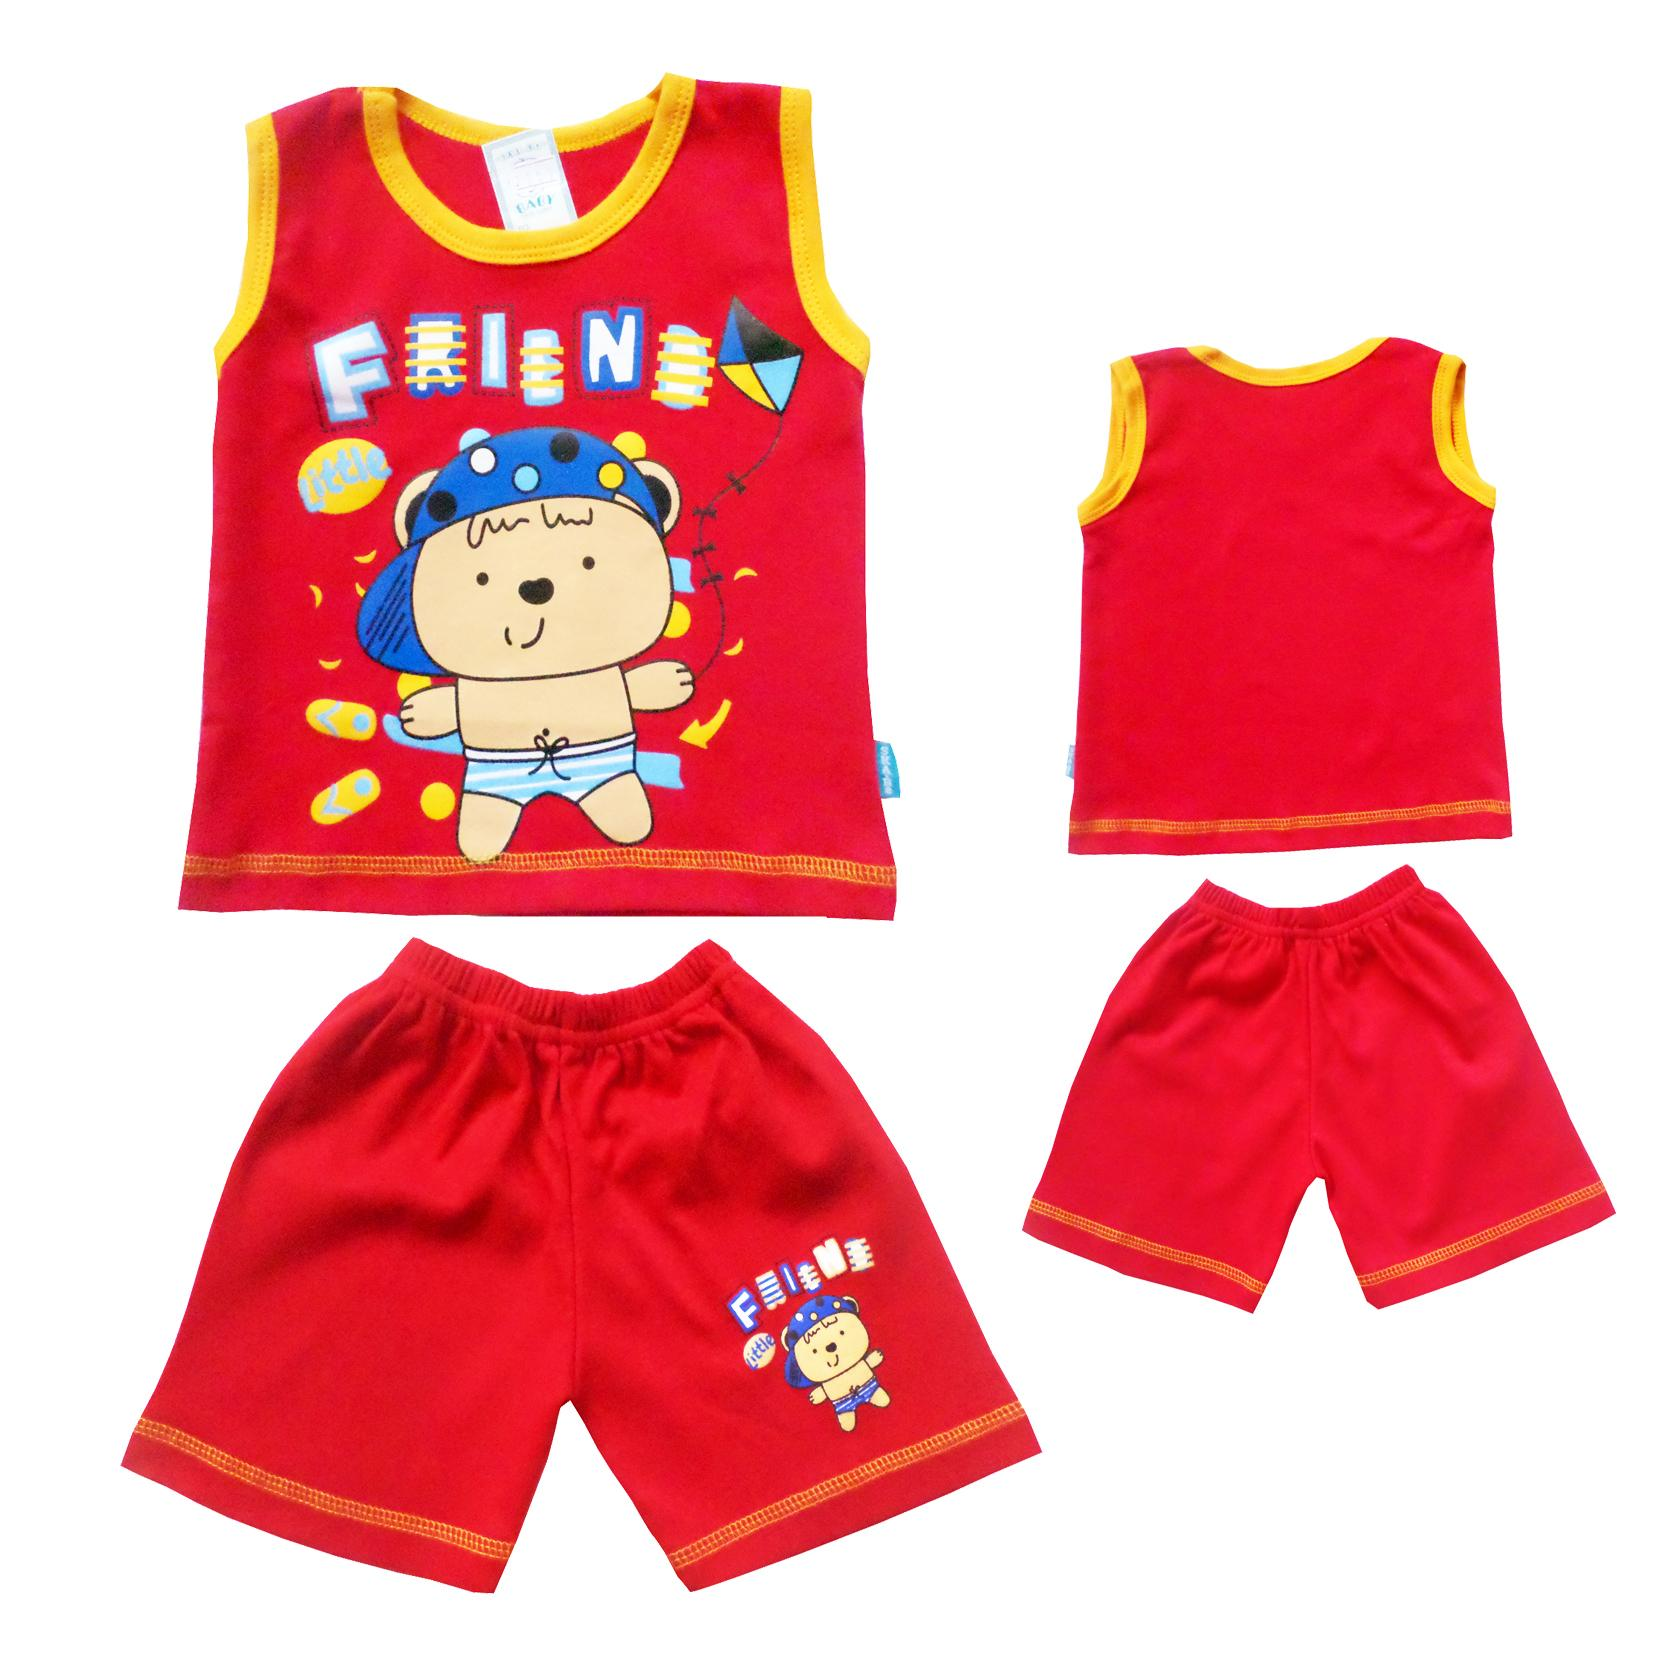 ... Paket Hemat Waka Baby Set Pakaian Baju Anak Bayi Laki - Kode B - 3 ...